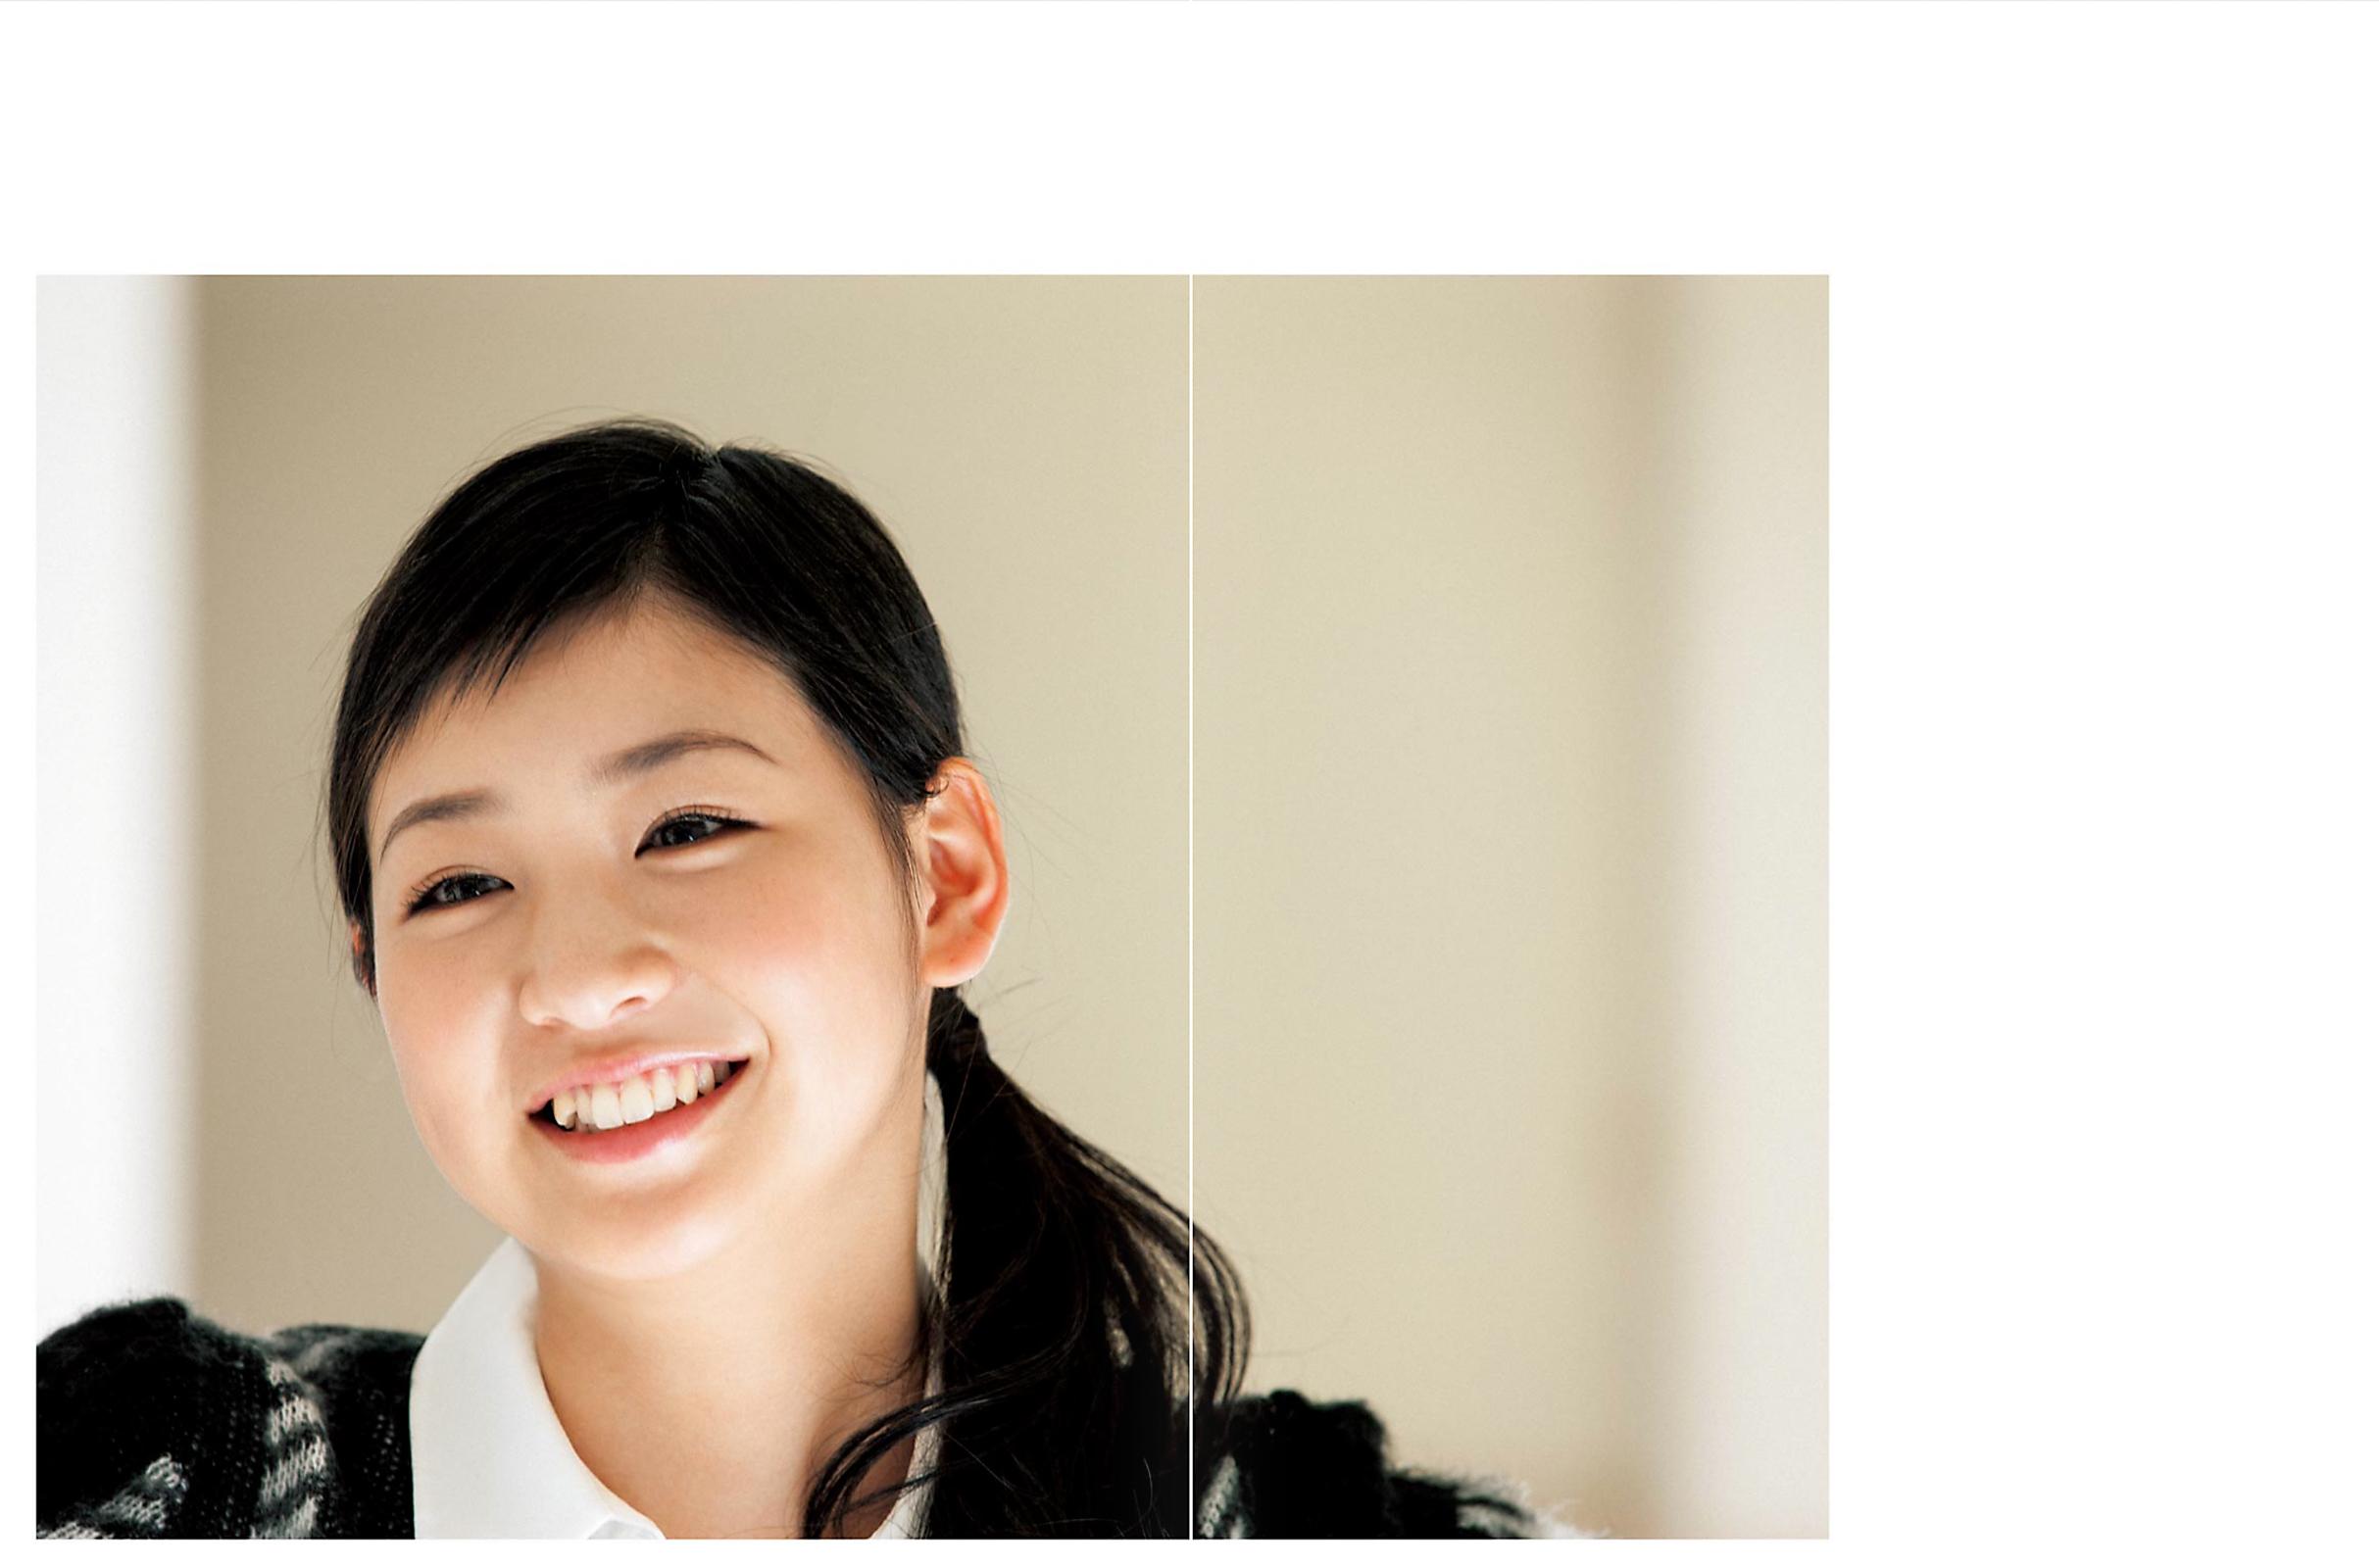 image http://scanlover.com/assets/images/4875-QvHZc82GfR2uyqsX.jpeg